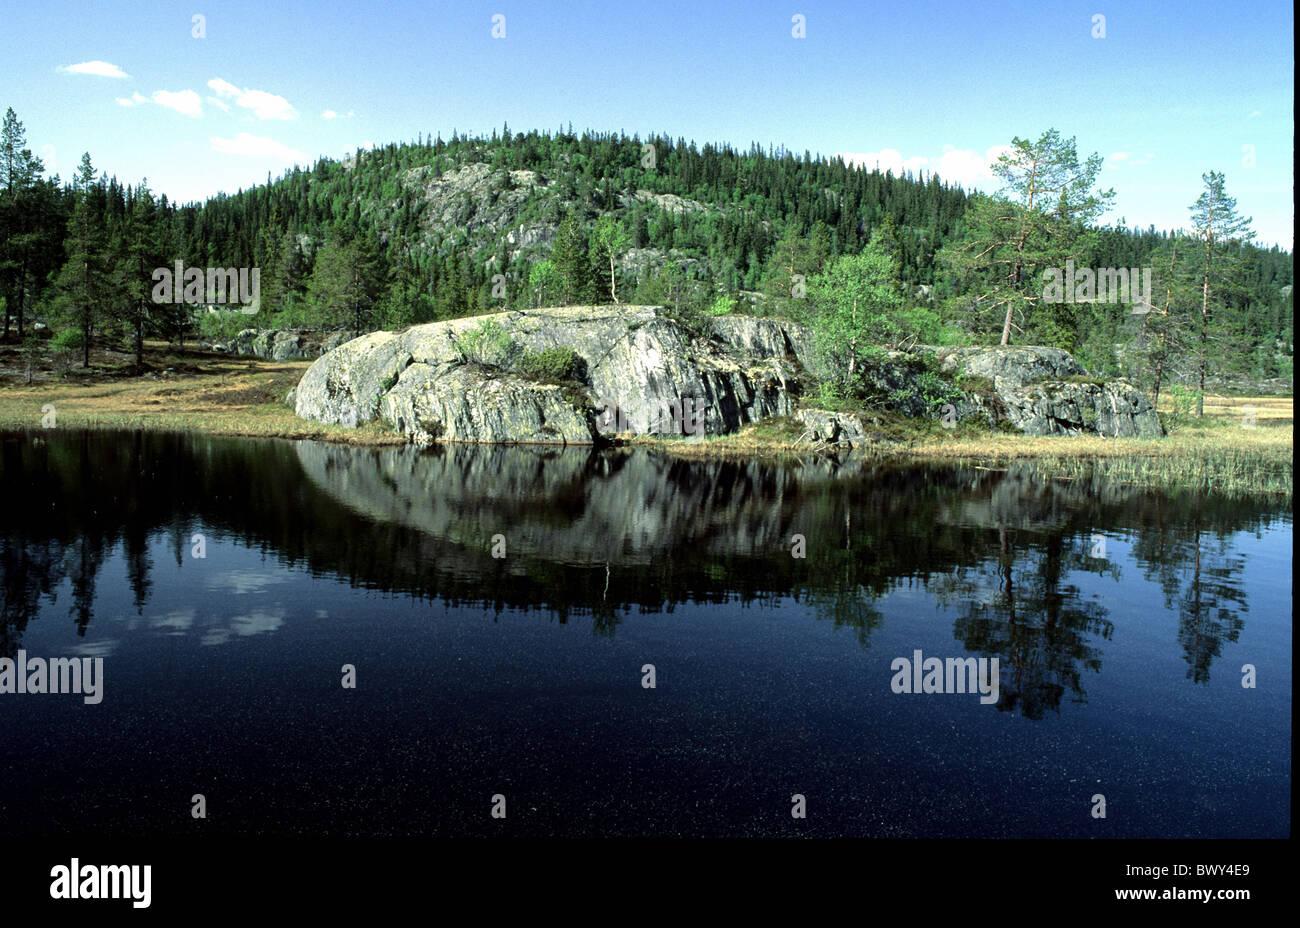 near Amot rock cliff body of water scenery Norway Europe reflection telemark Stock Photo